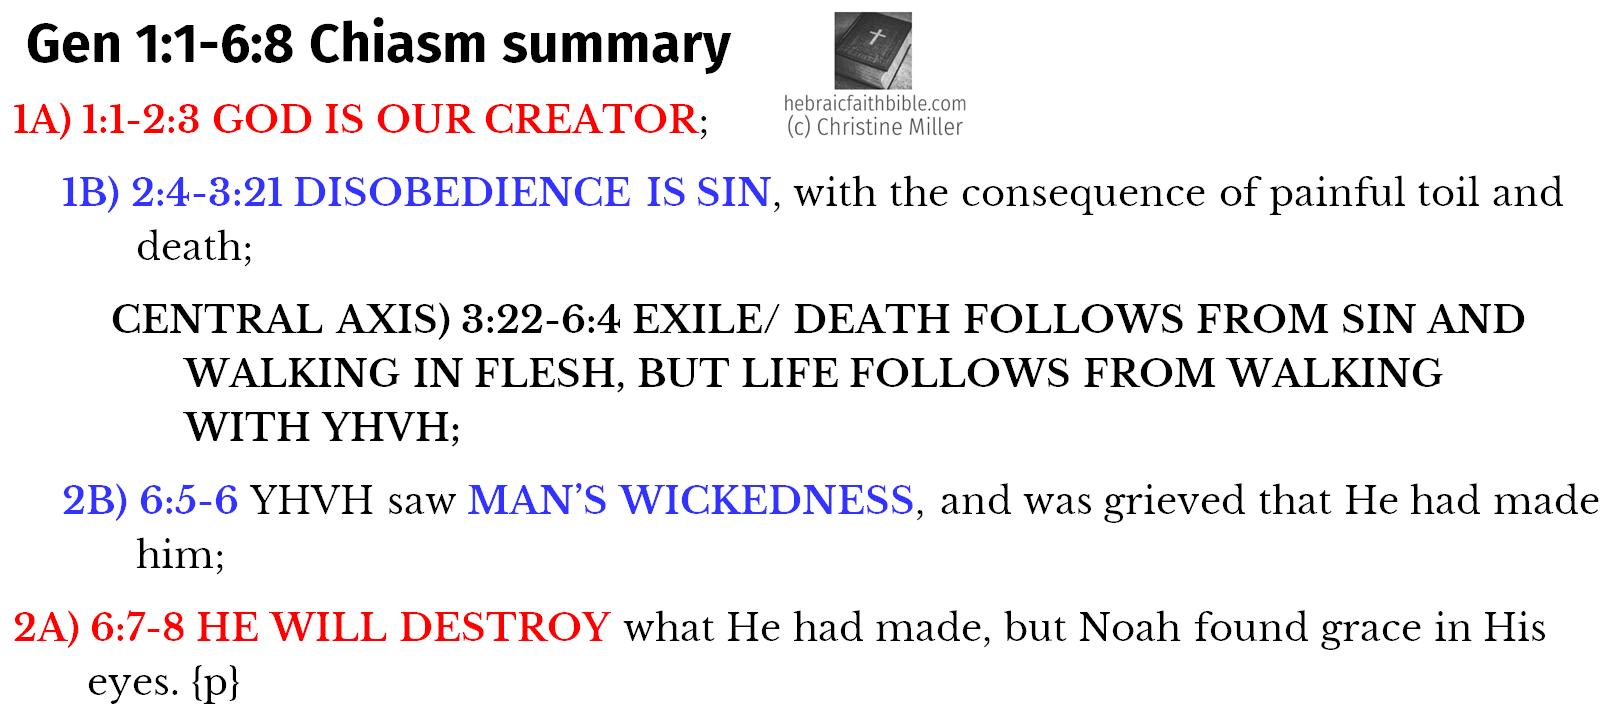 Gen 1:1-6:8 Bereisheet Chiasm Summary   hebraicfaithbible.com